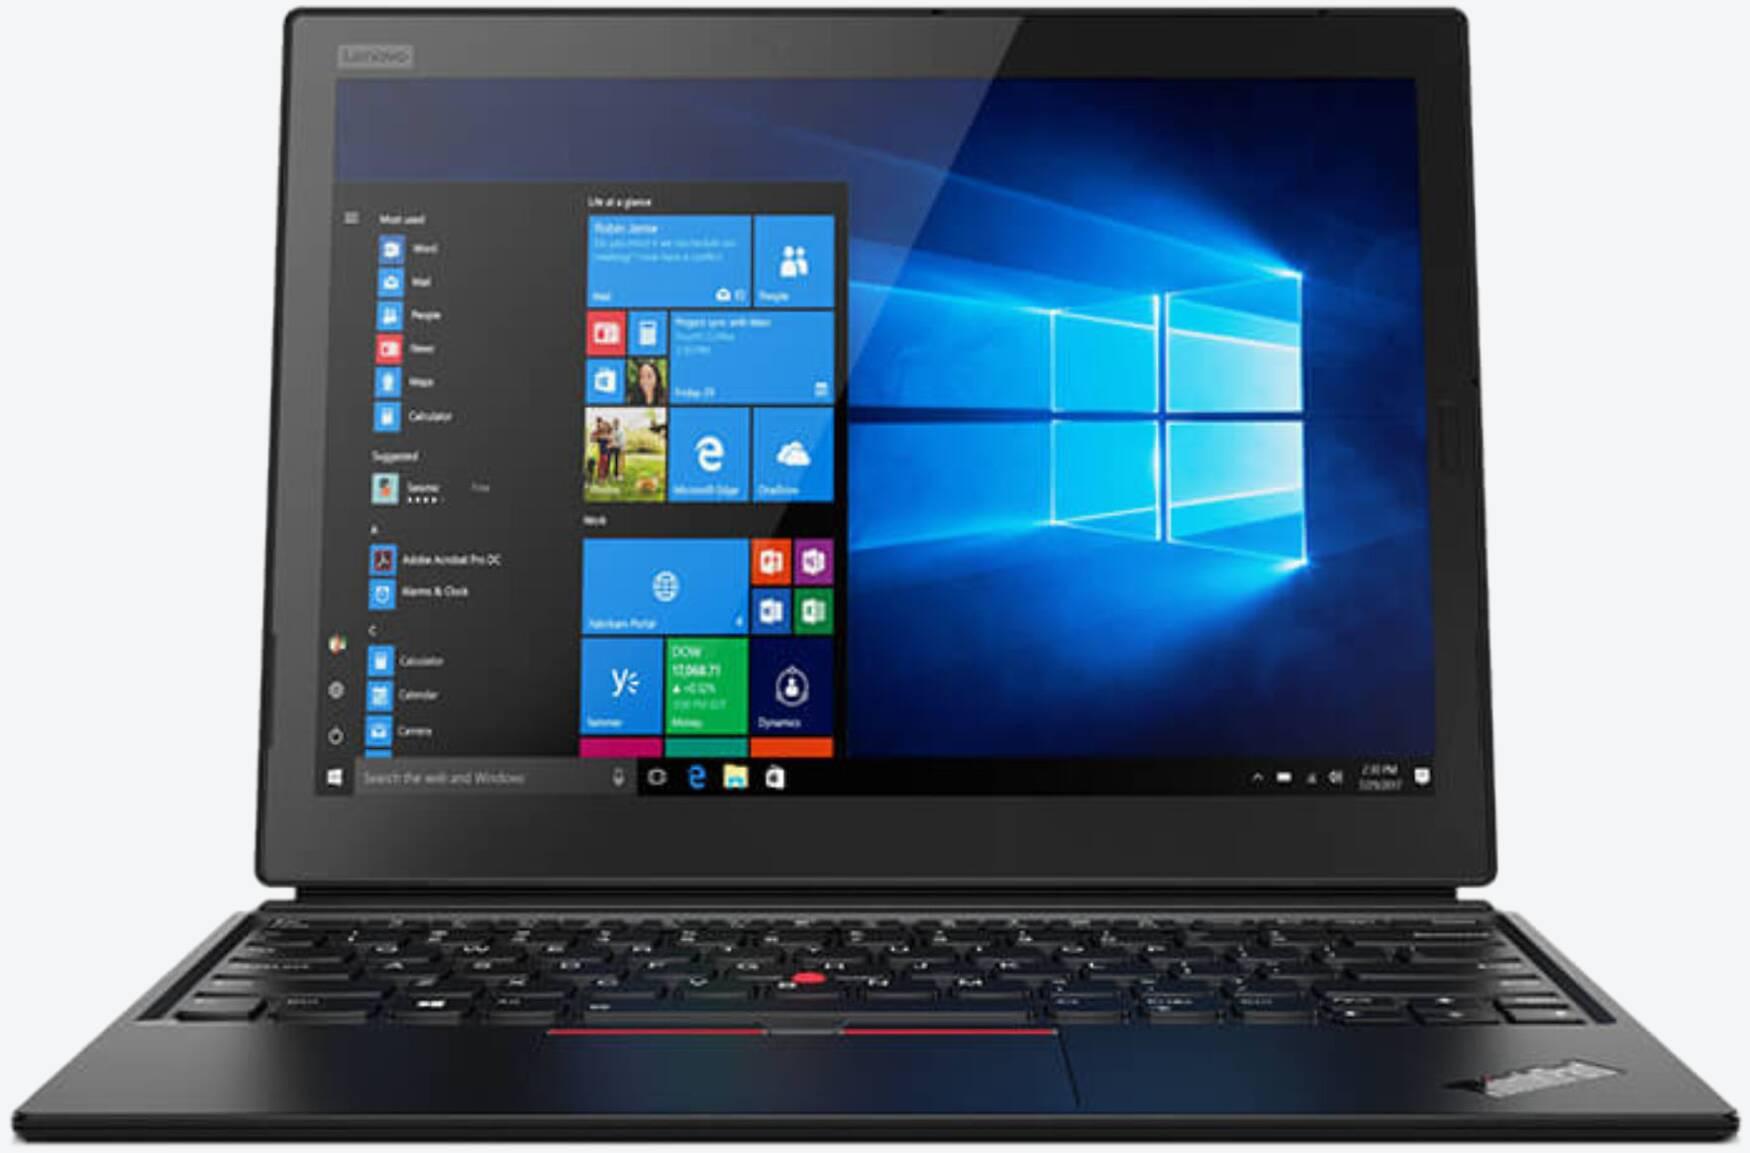 Lenovo ThinkPad X1 Yoga G3 LTE 20LD003JGE